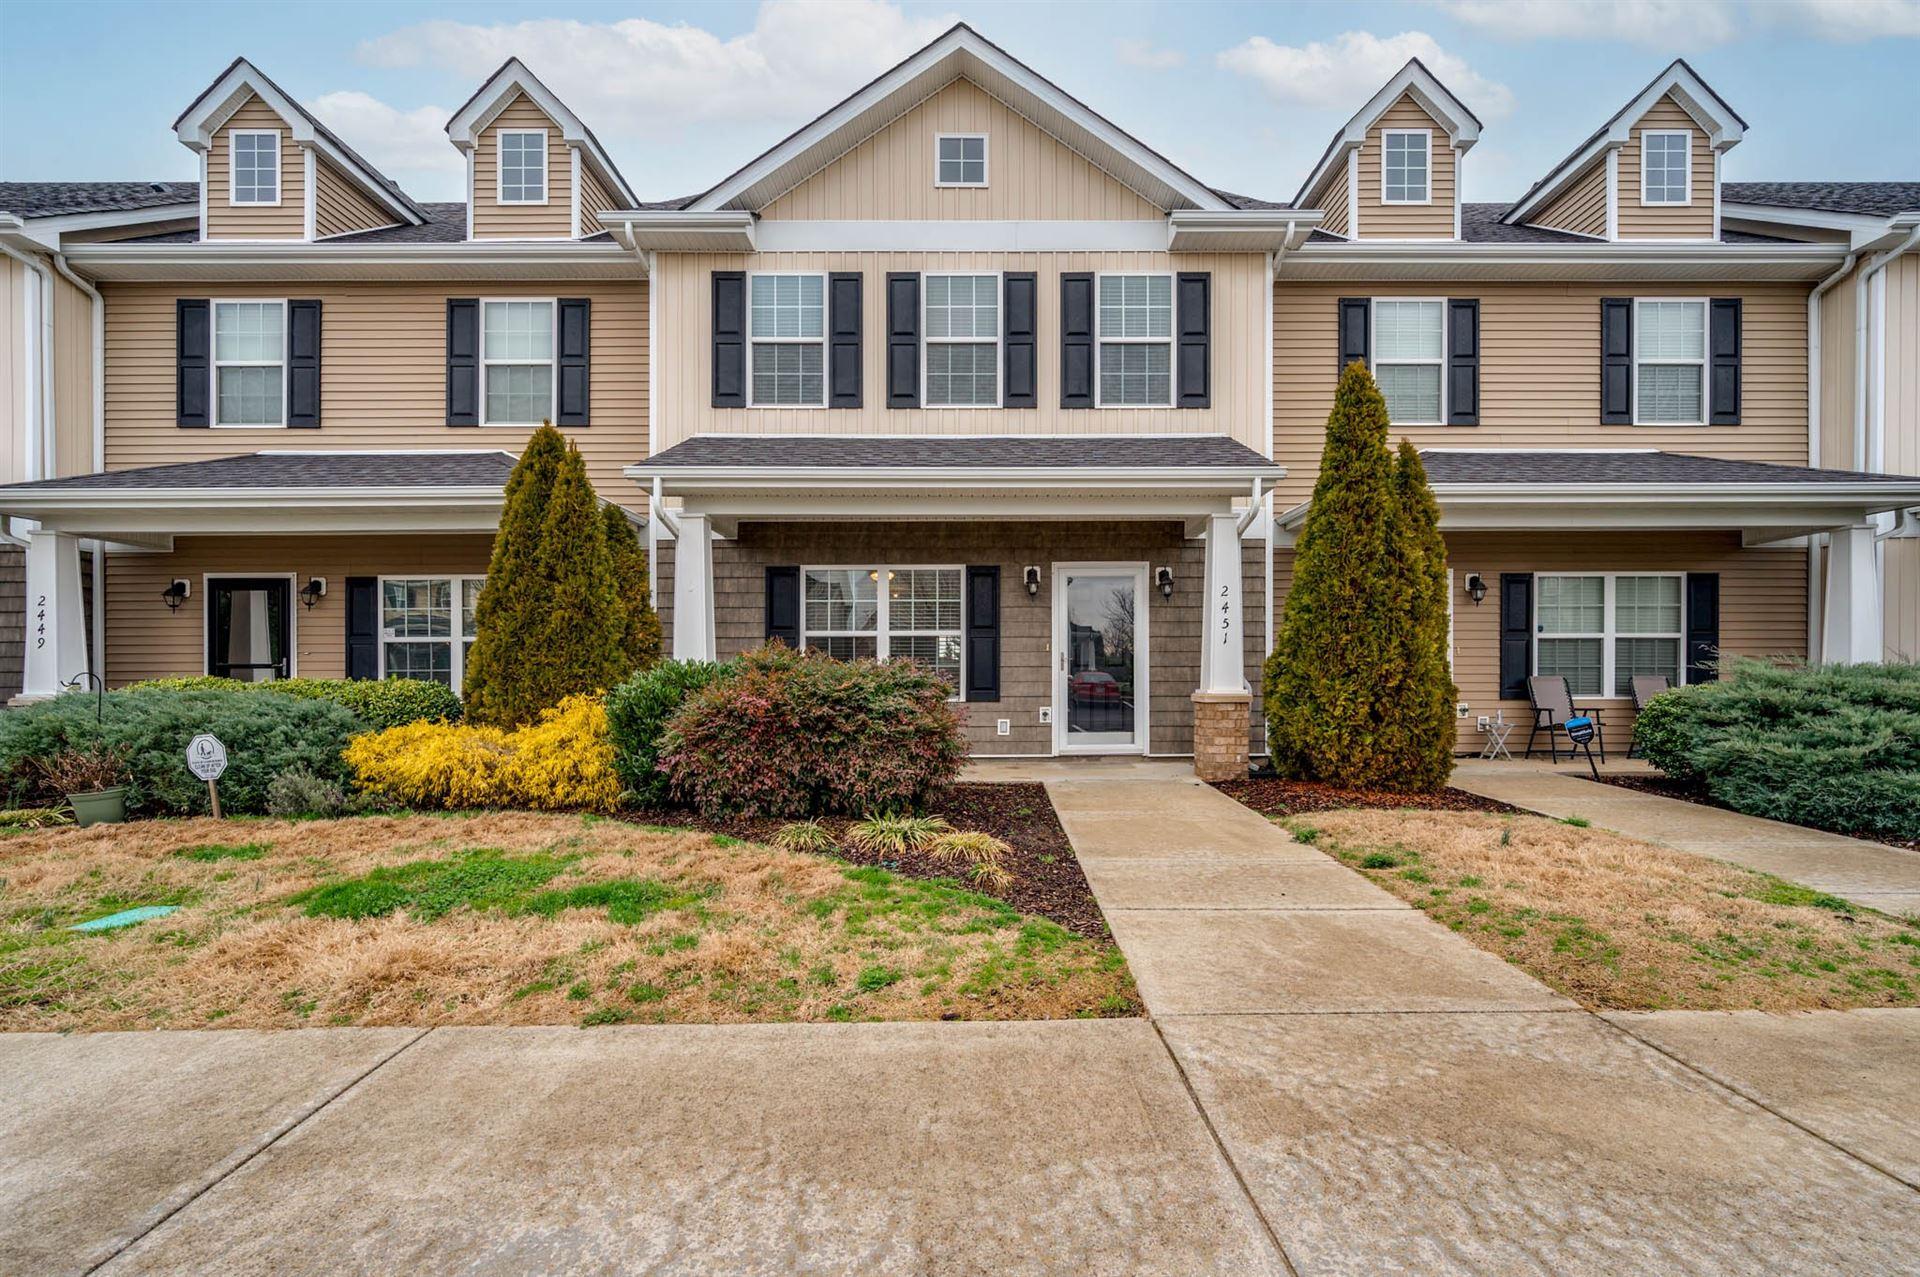 2451 New Holland Circle #29, Murfreesboro, TN 37128 - MLS#: 2233144